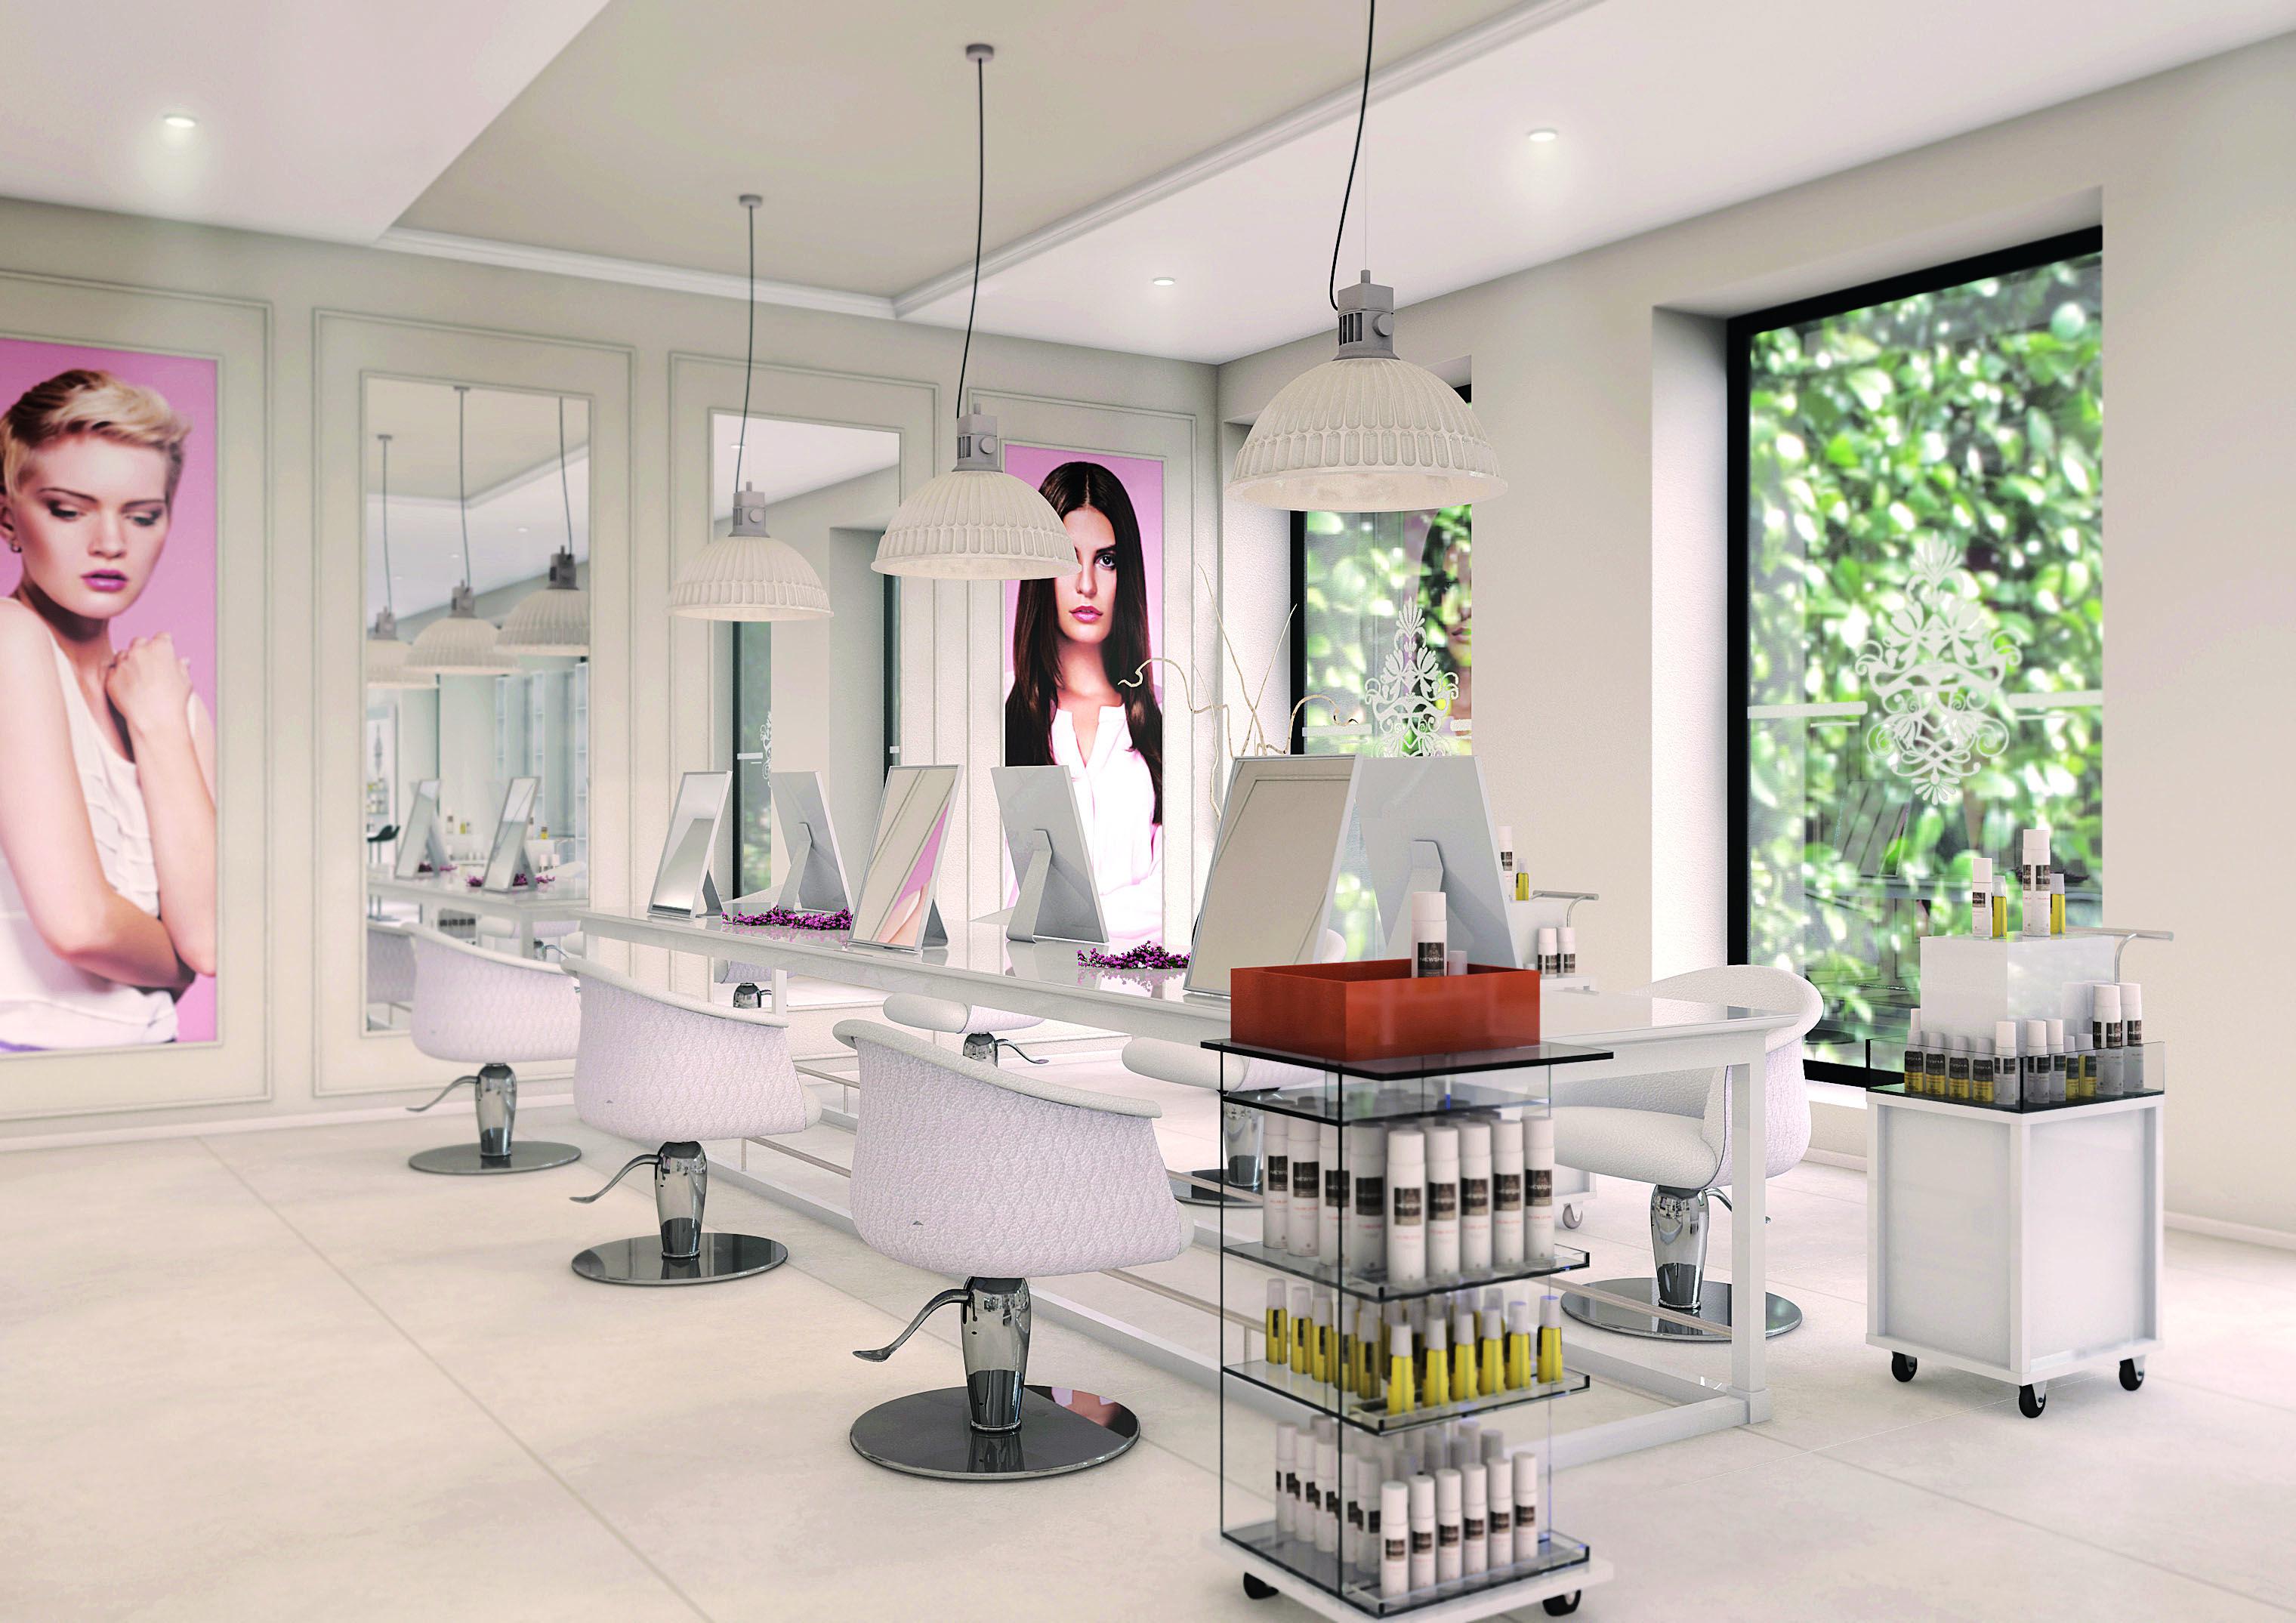 3d Salonkonzept Von Idea Friseureinrichtungen Hair Beauty Salon Furniture Design Idea Friseureinrichtung Friseur Friseureinrichtung Salon Einrichtung